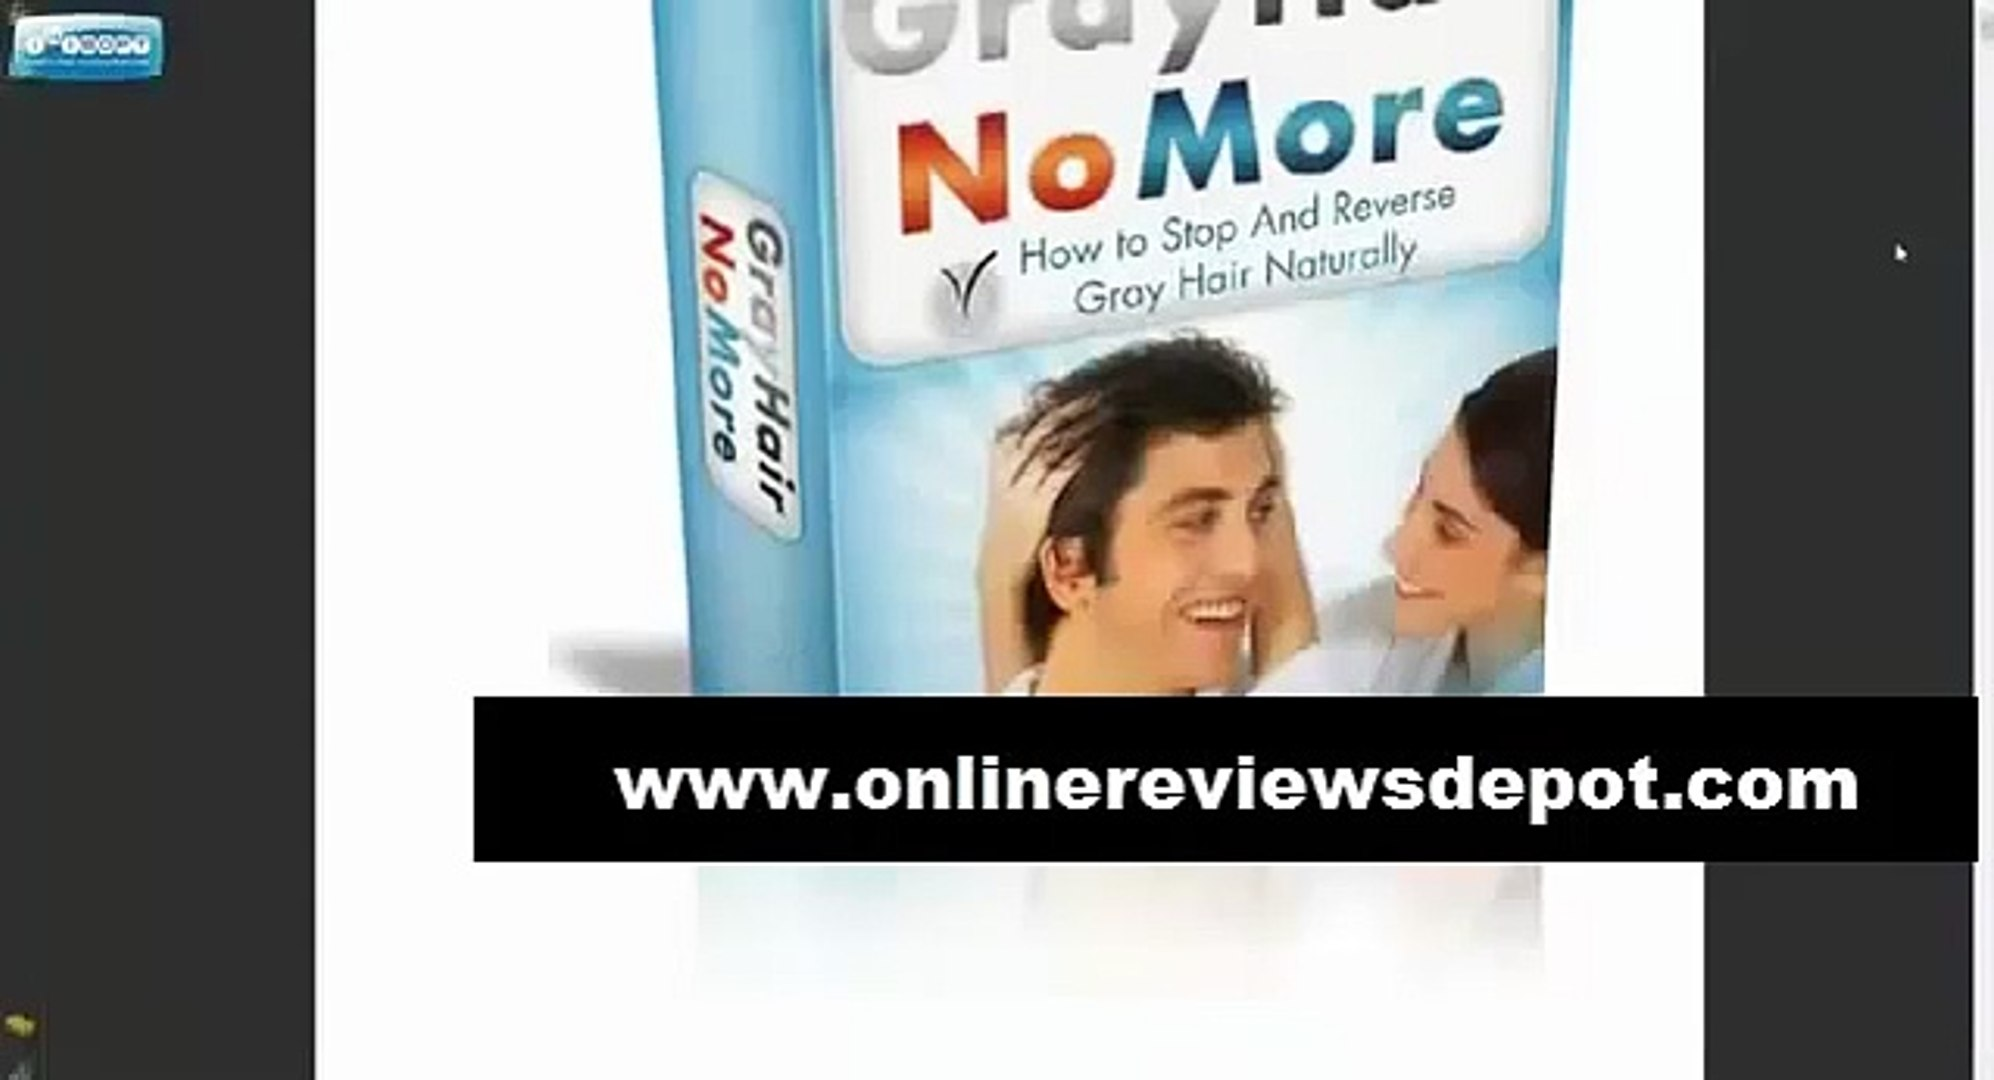 How to stop and reverse Gray hair naturally - gray hair no more reviews